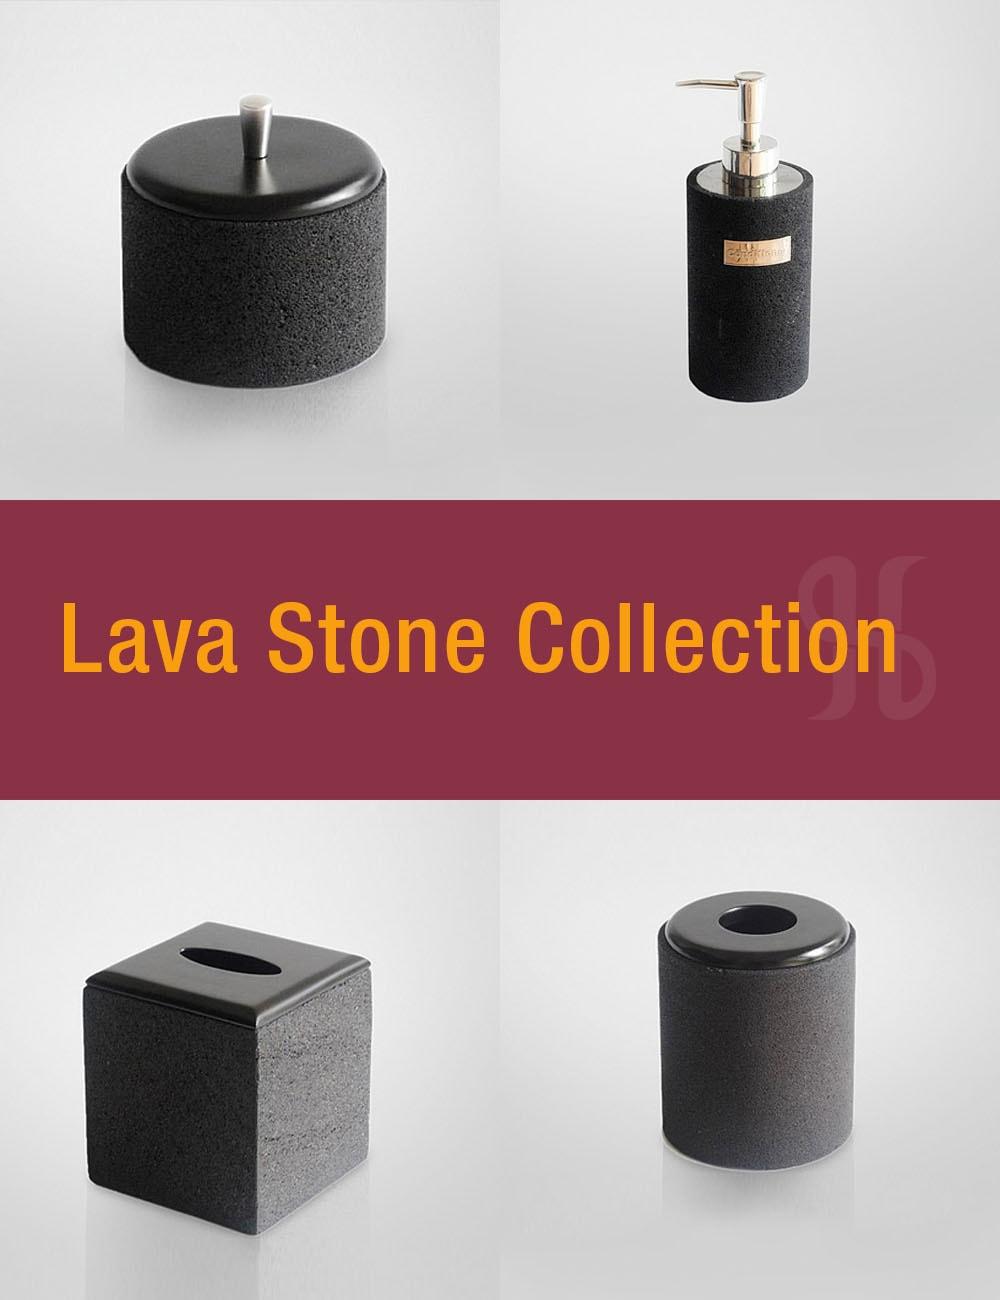 Lava Stone Collection